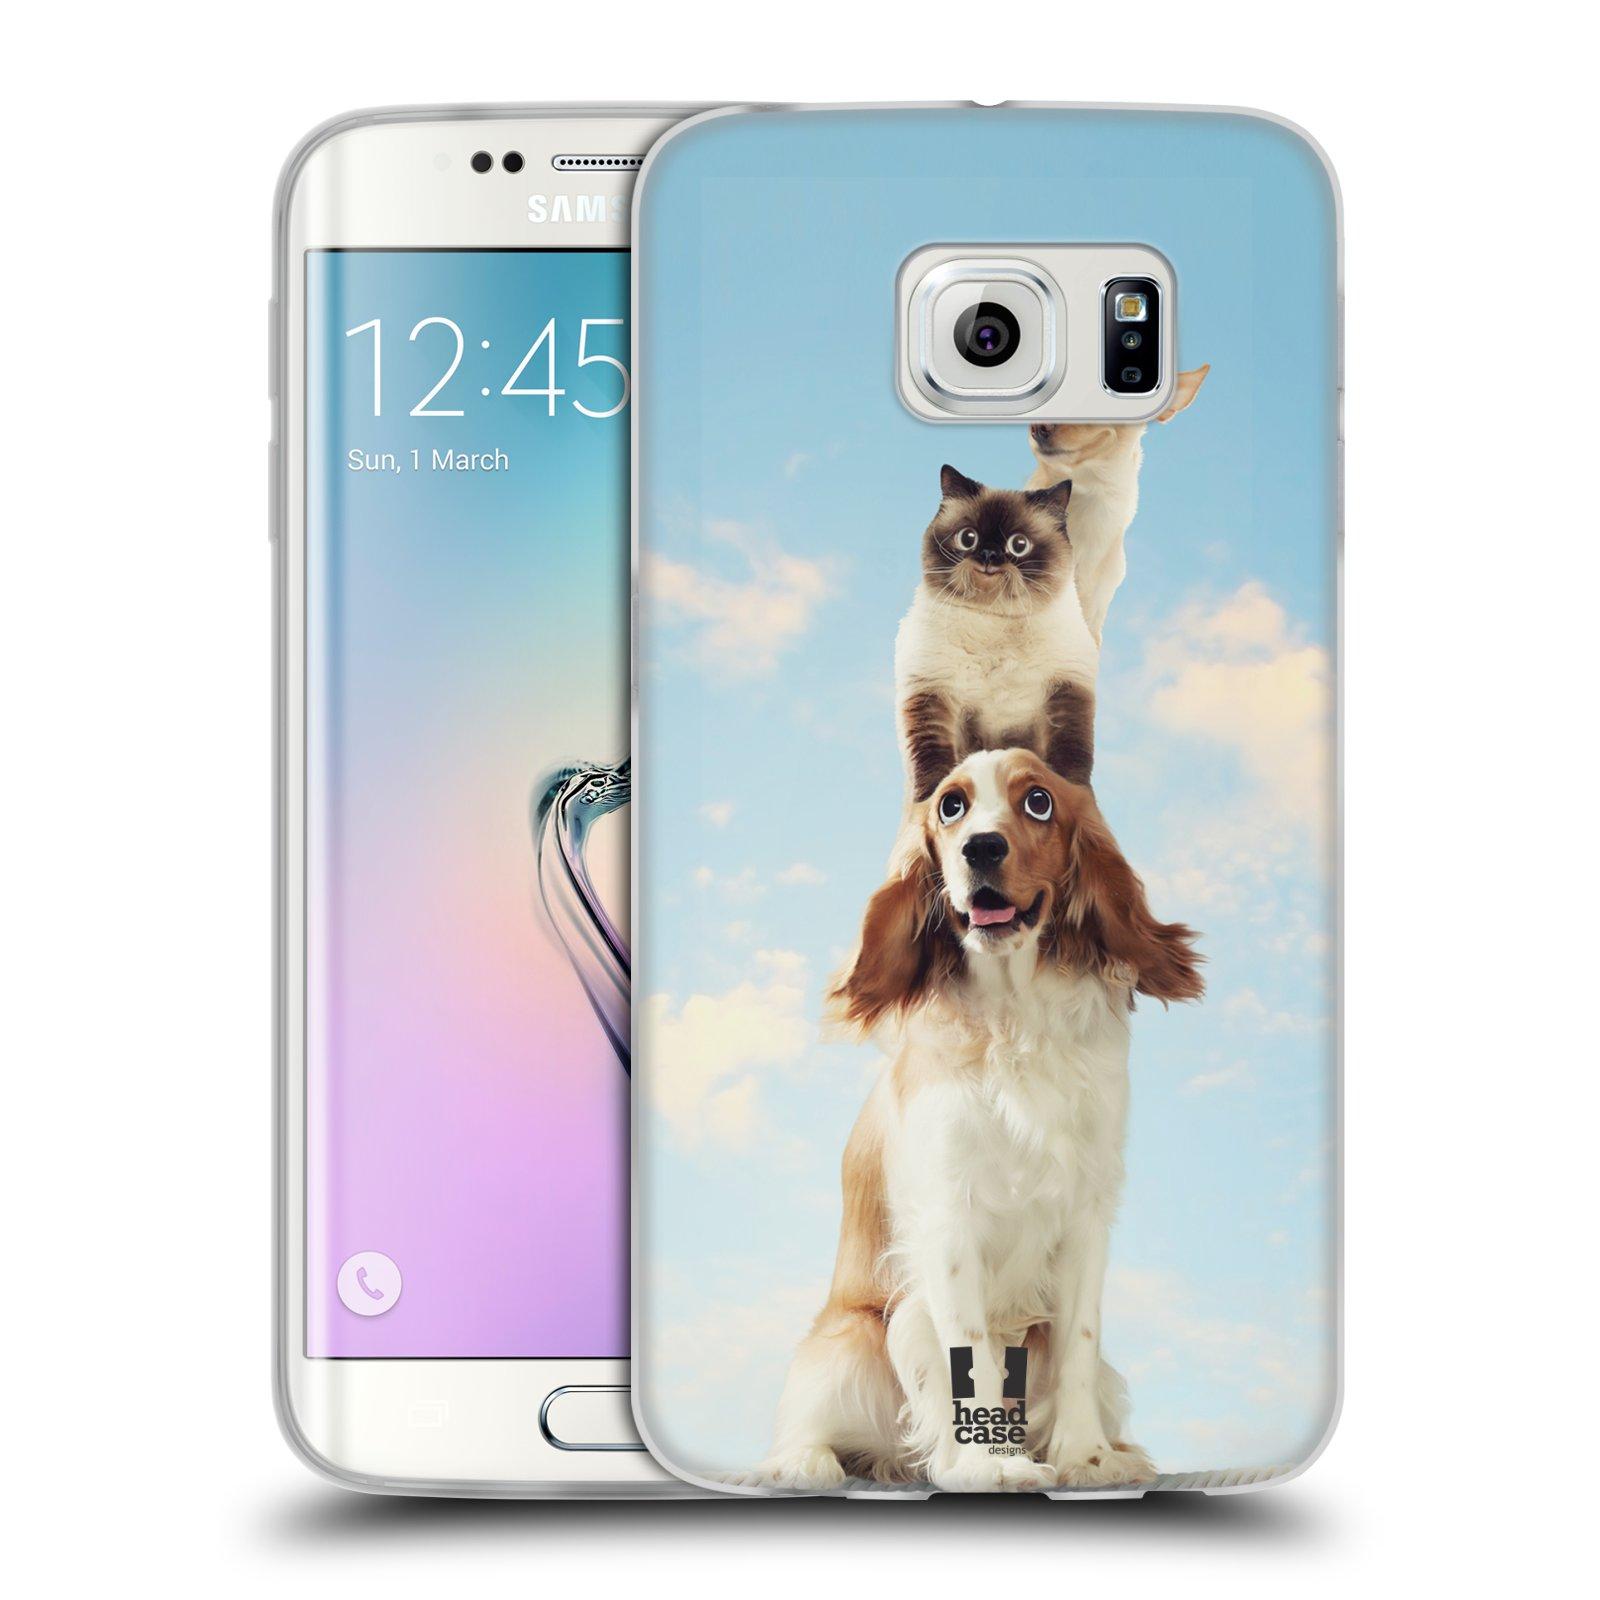 HEAD CASE silikonový obal na mobil Samsung Galaxy S6 EDGE vzor Legrační zvířátka zvířecí totem